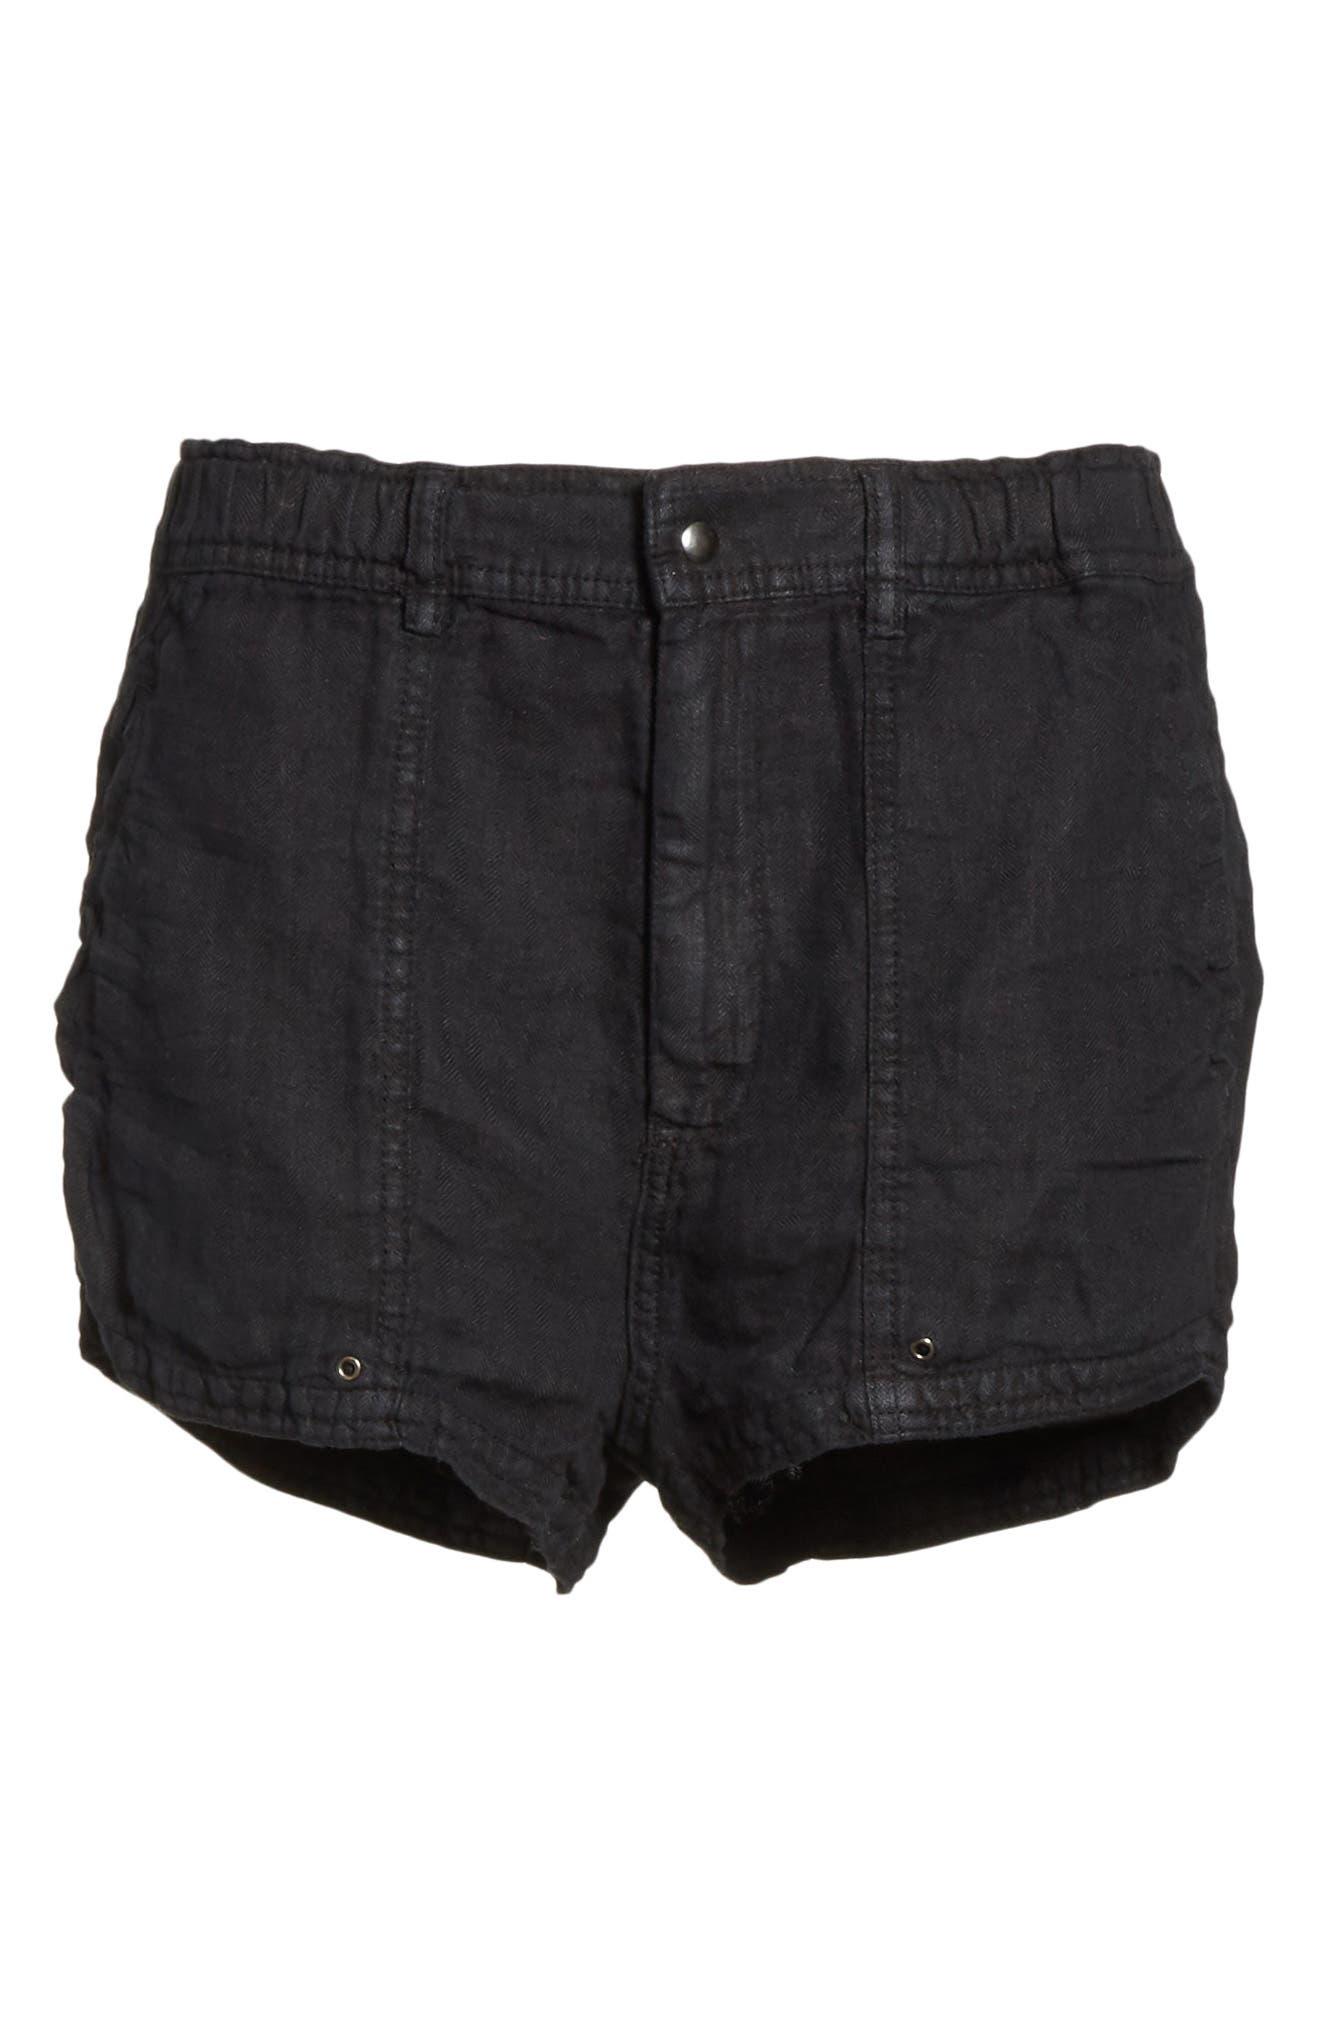 Beacon Utility Linen Shorts,                             Alternate thumbnail 6, color,                             Black